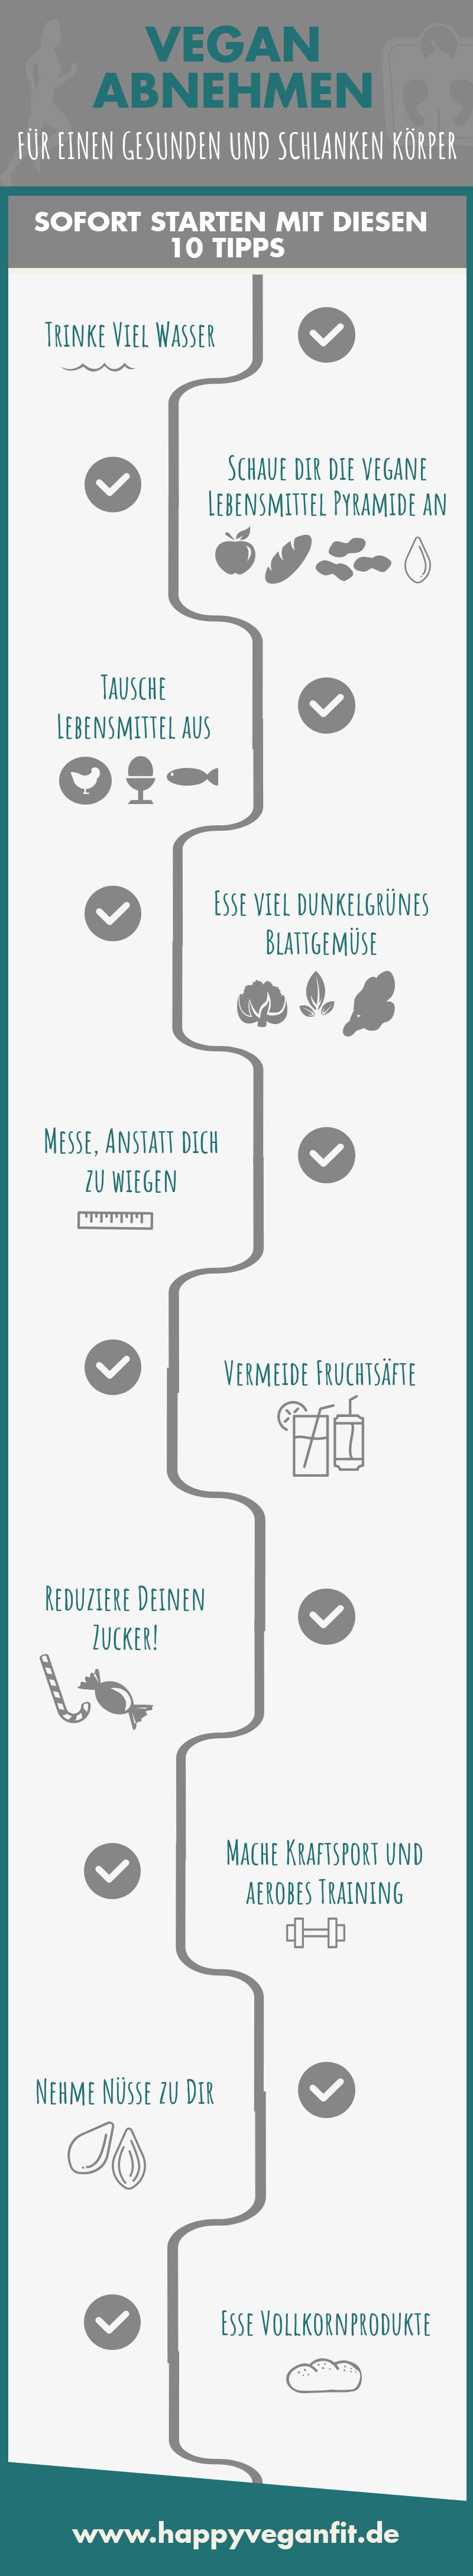 vegan abnehmen 10 tipps infografik